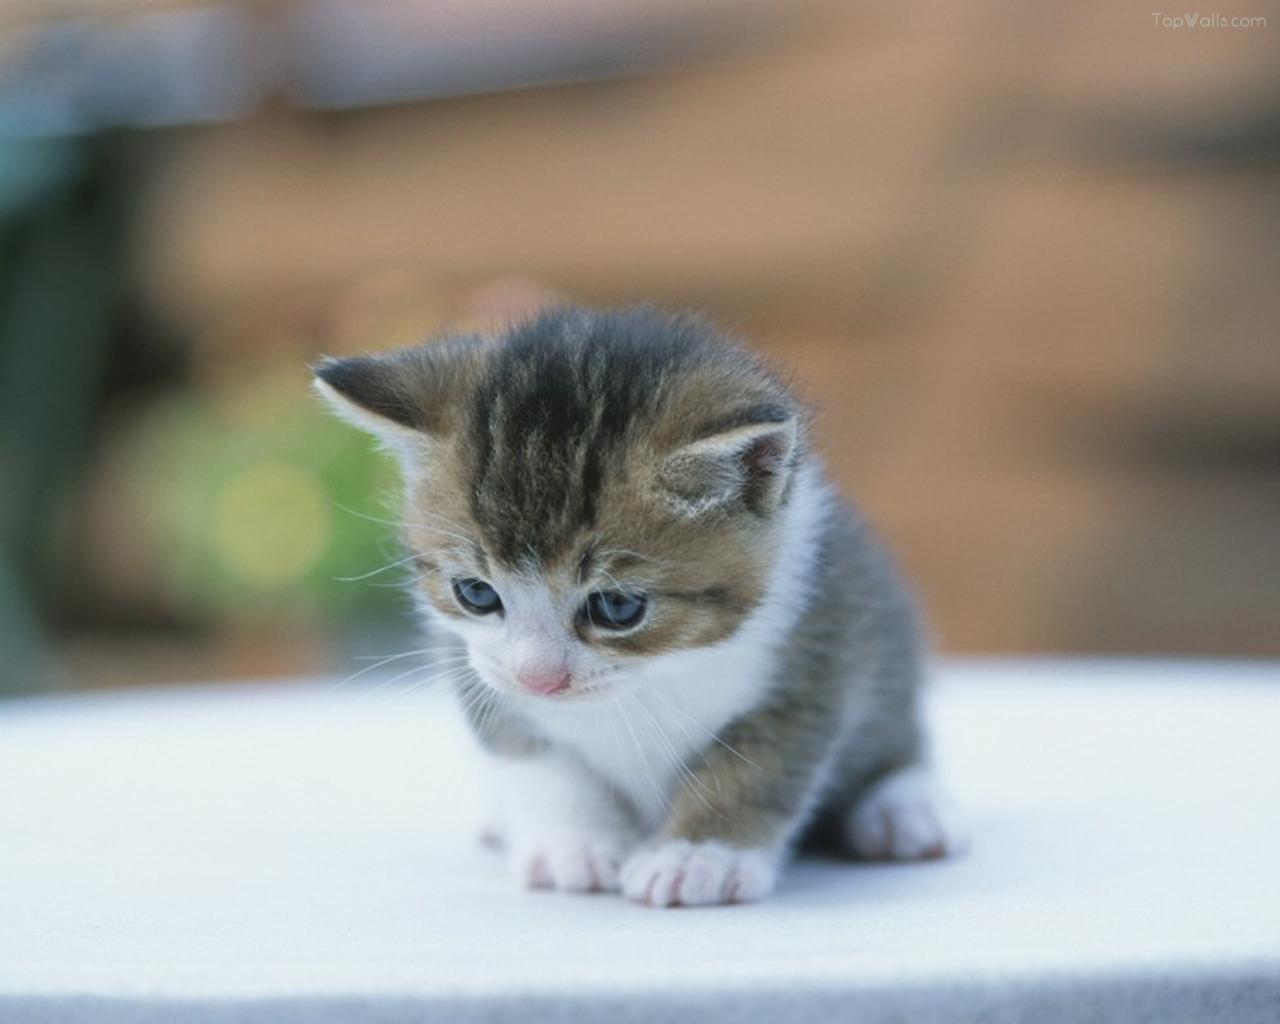 Kumpulan Gambar Dan Foto Anak Kucing Lucu Lucu Lengkap Dan Terbaru